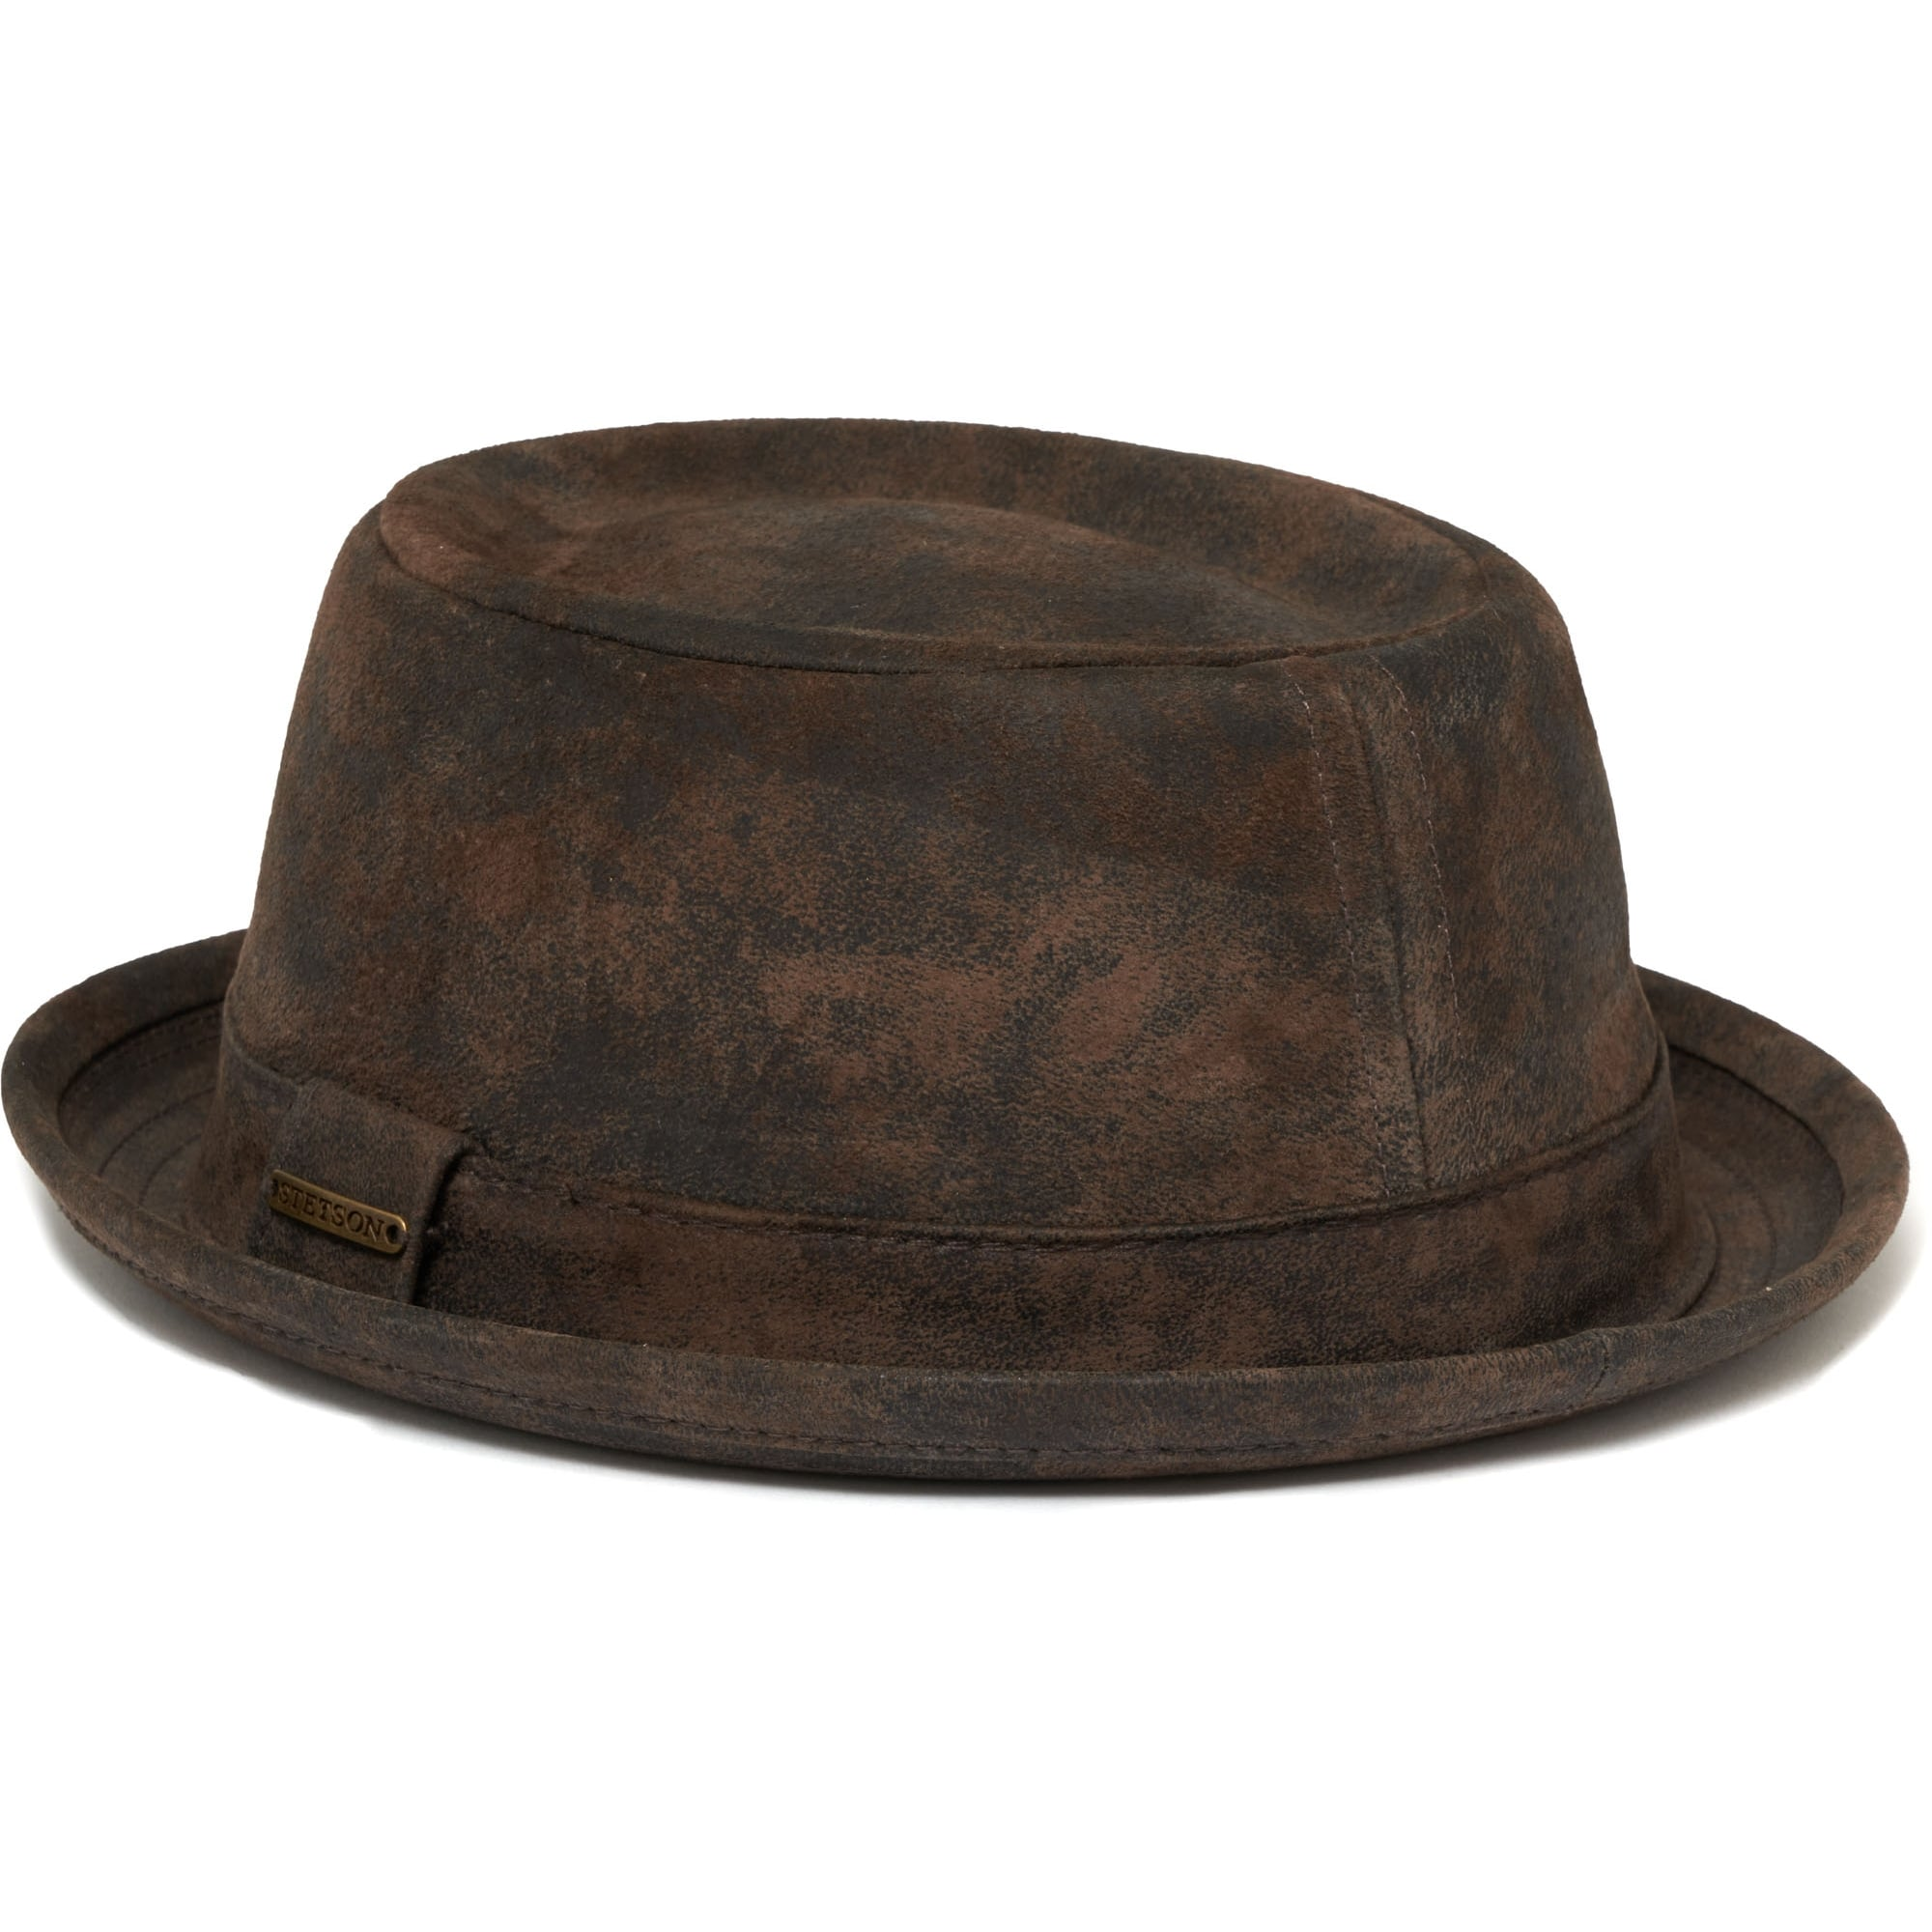 Stetson Odenton Pork Pie Cloth Hat 35278  99363d73d14